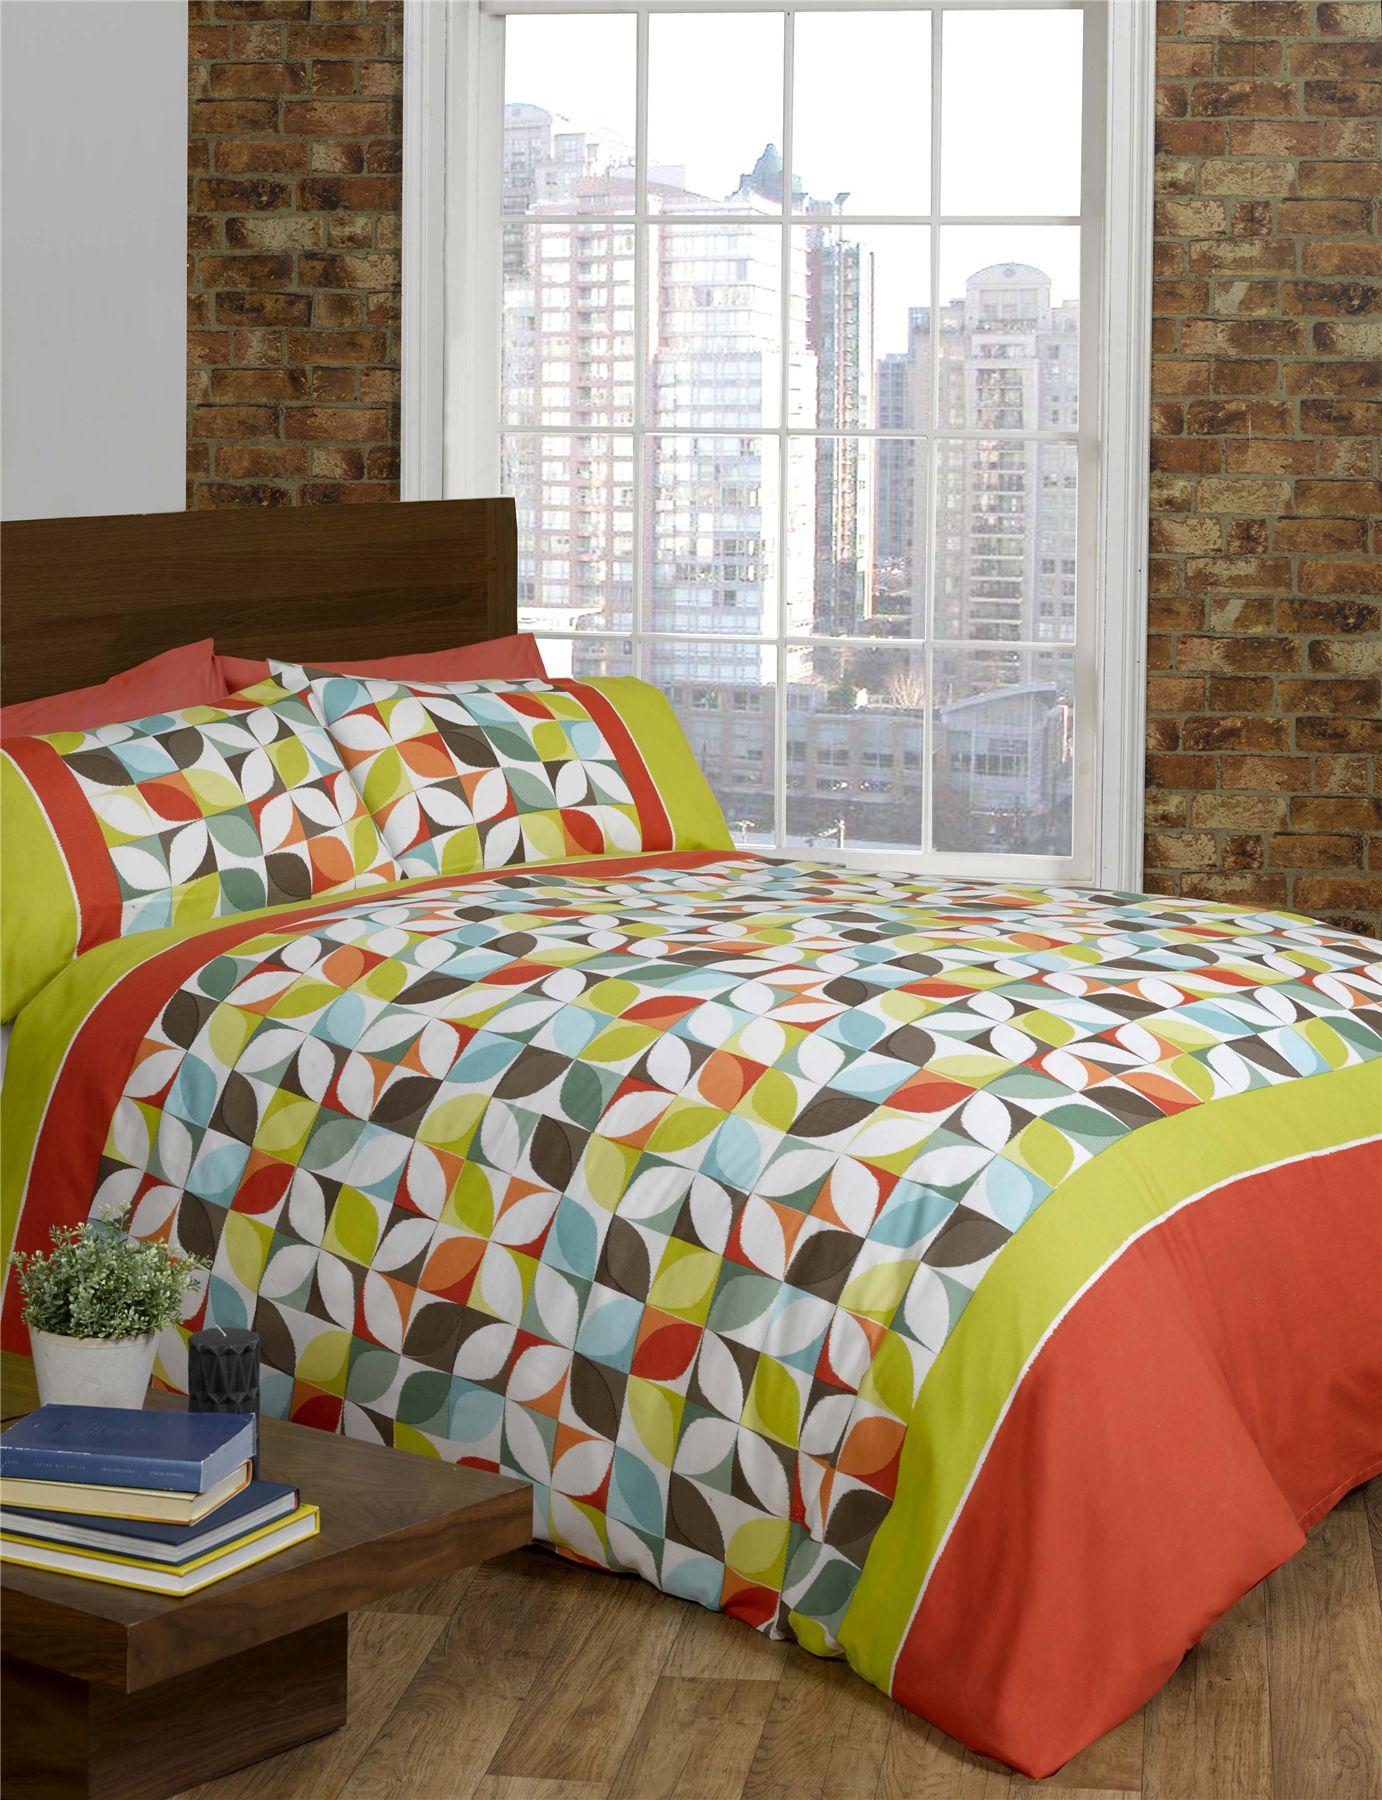 lime green orange purple quilt duvet cover  pcase bed set  - limegreenorangepurplequiltduvetcoveramp